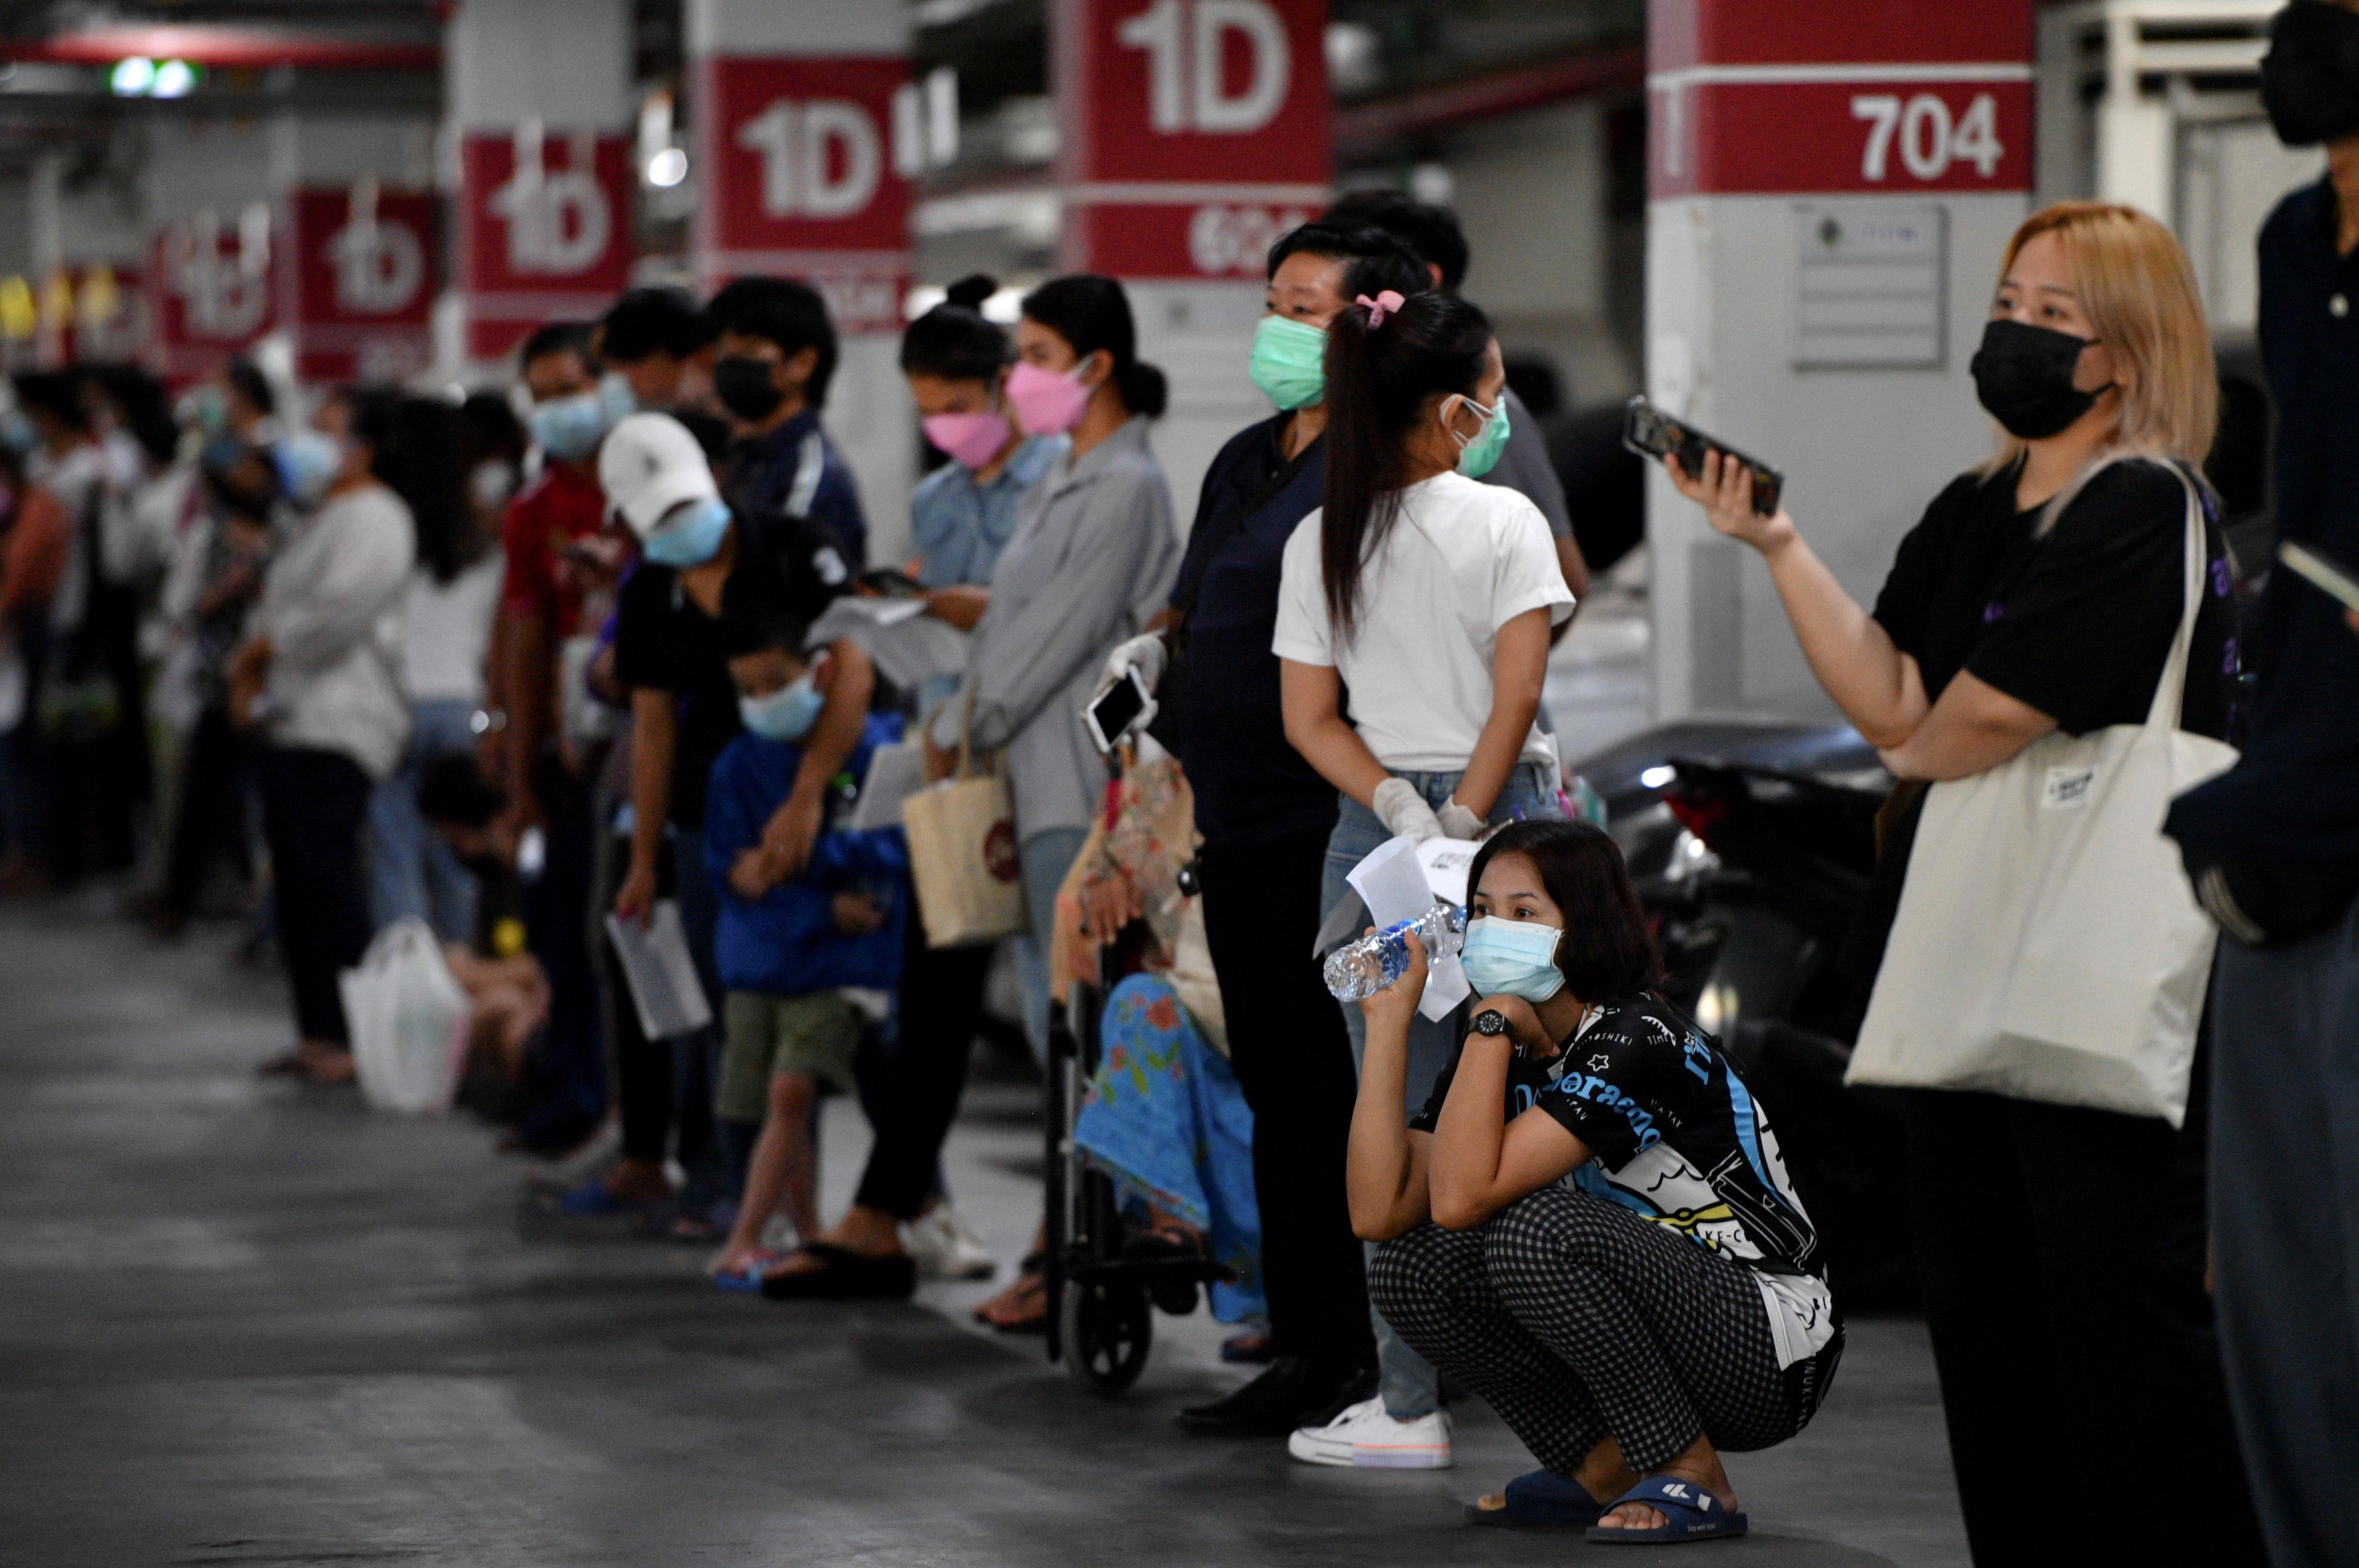 People queue for free coronavirus tests in Bangkok, Thailand, July 15, 2021. REUTERS/Chalinee Thirasupa/File Photo